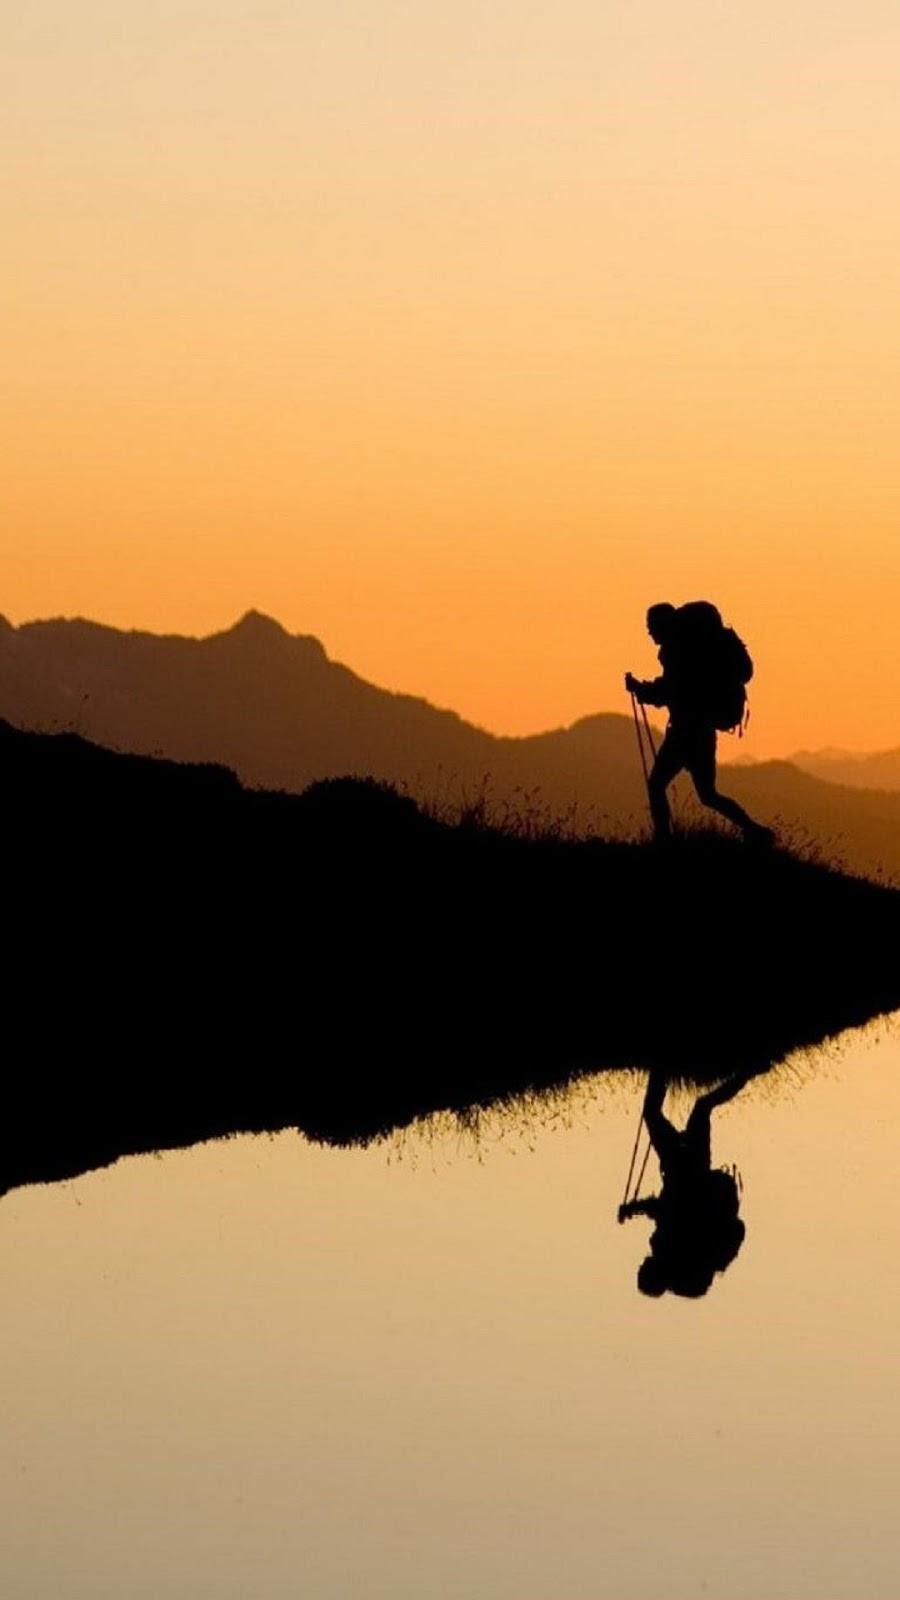 Wallpaper Android Pendaki Gunung